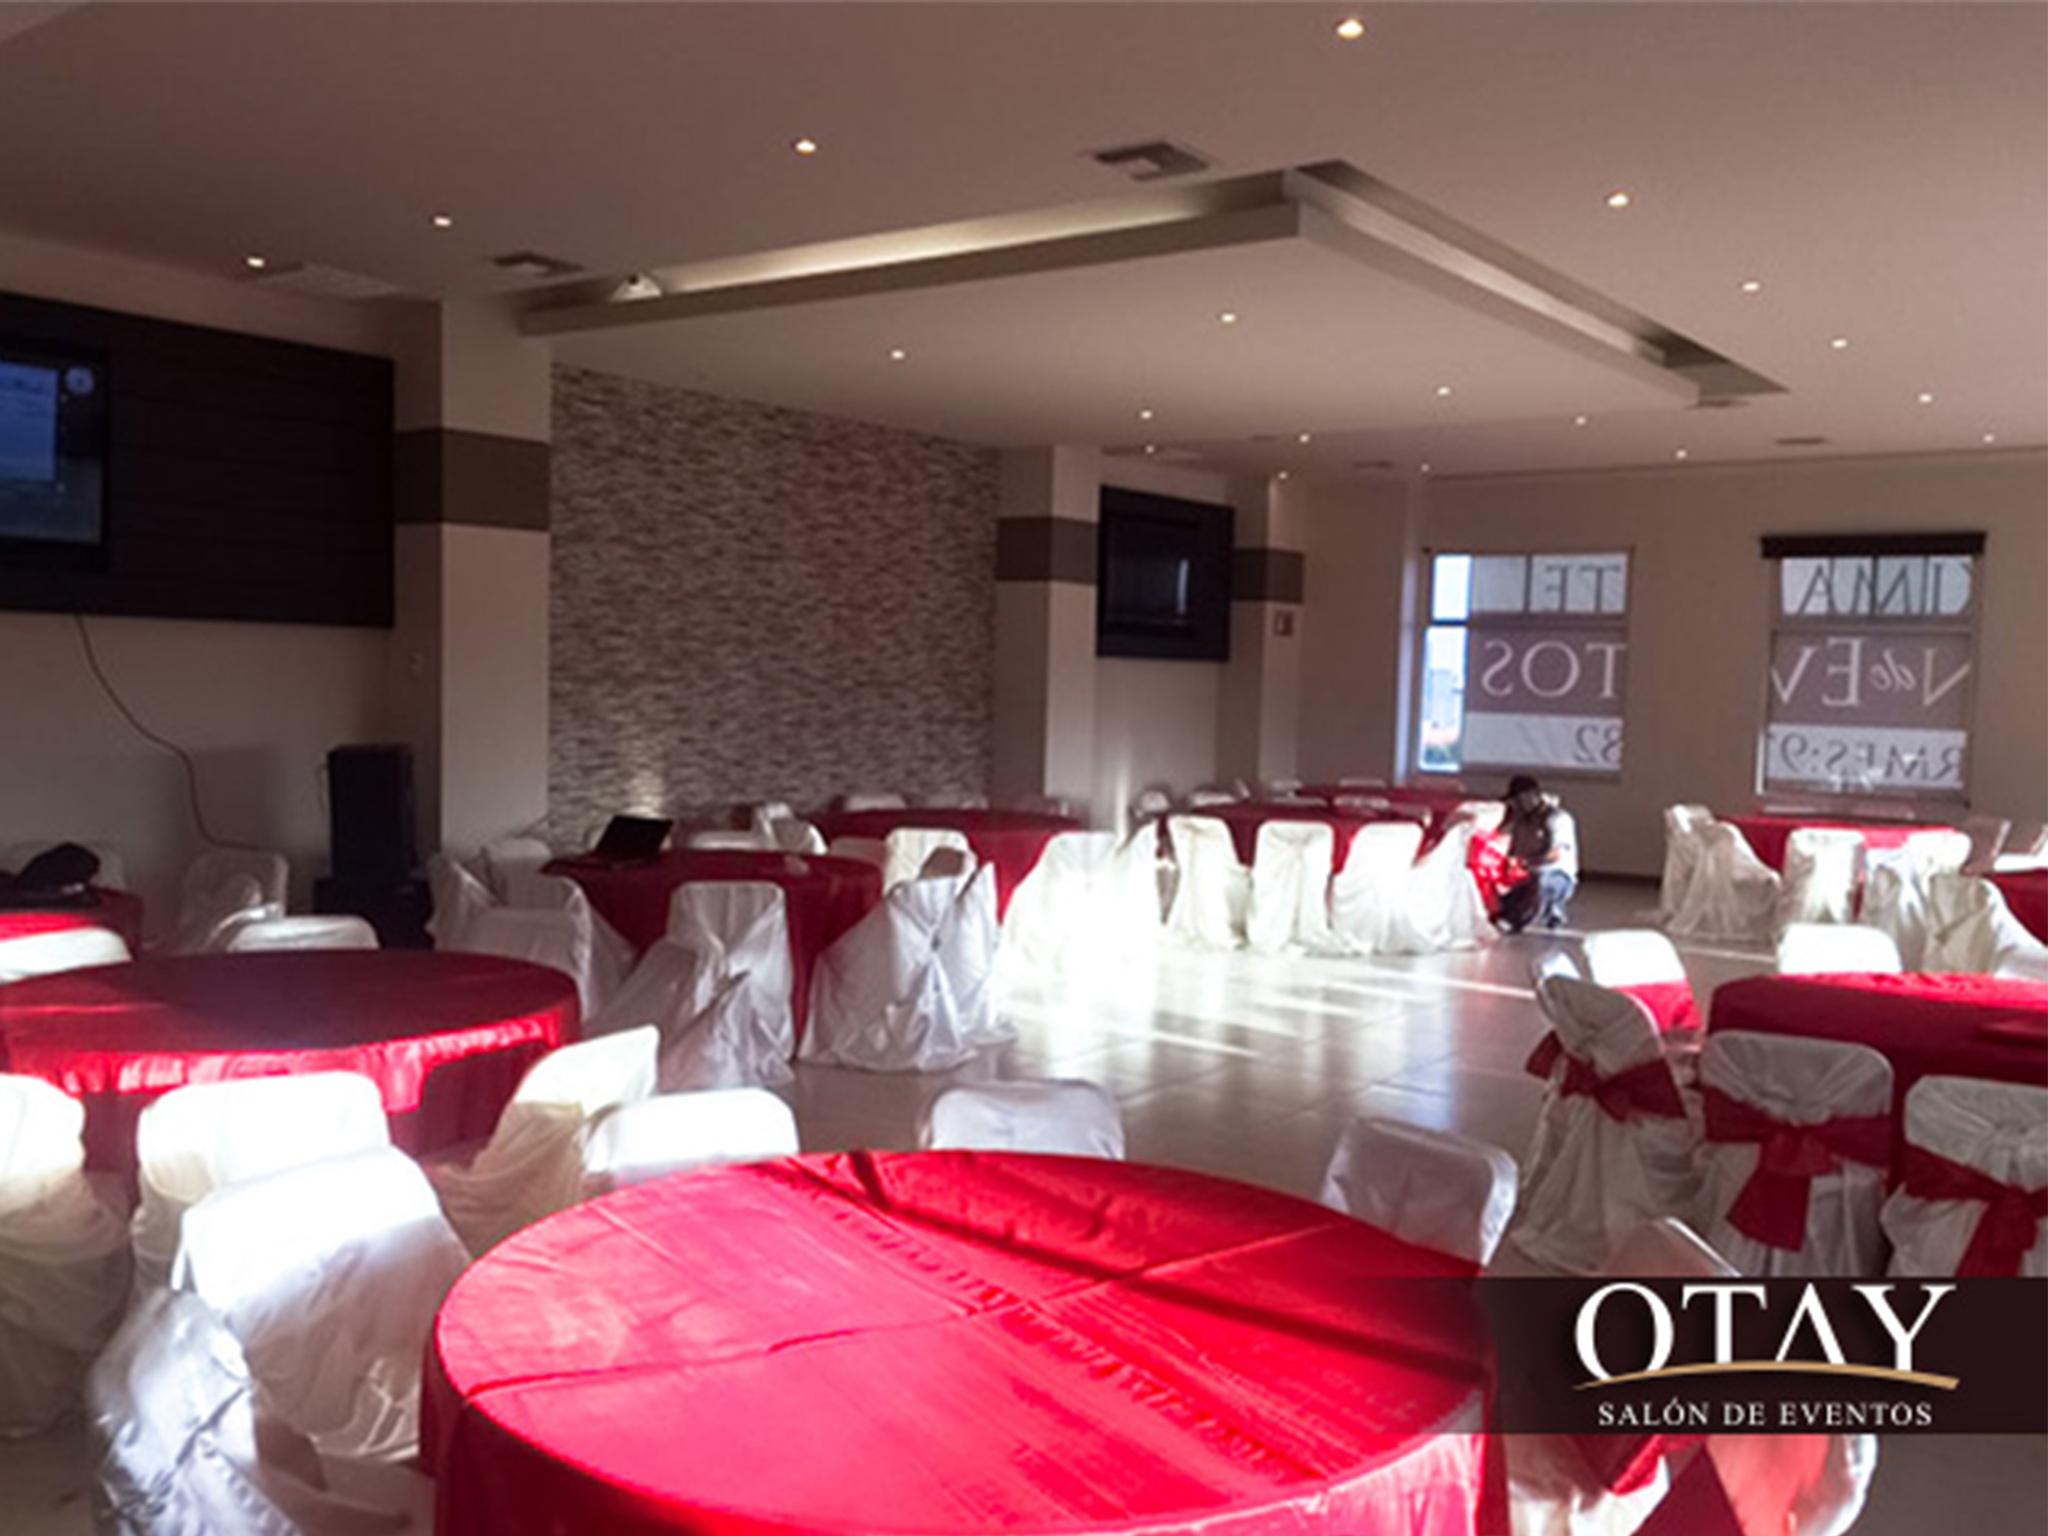 Salon de eventos otay for Acropolis salon de eventos